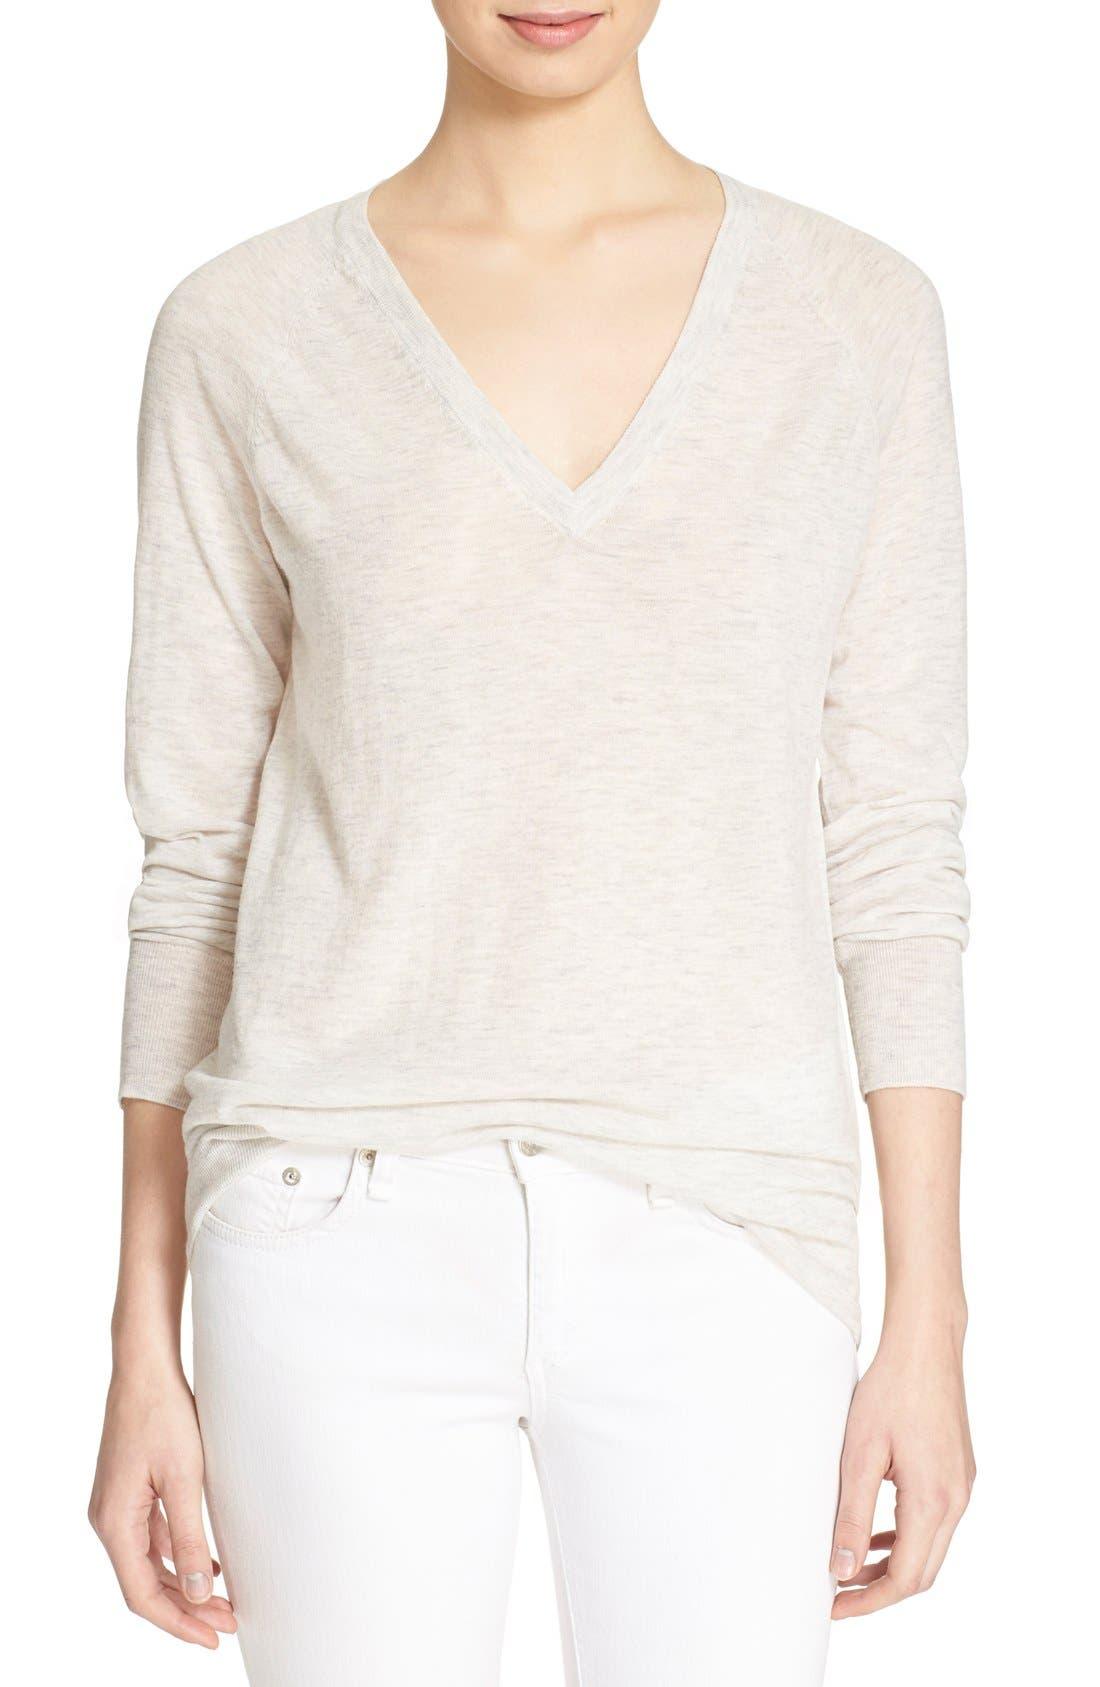 Main Image - Equipment 'Asher' V-Neck Sweater